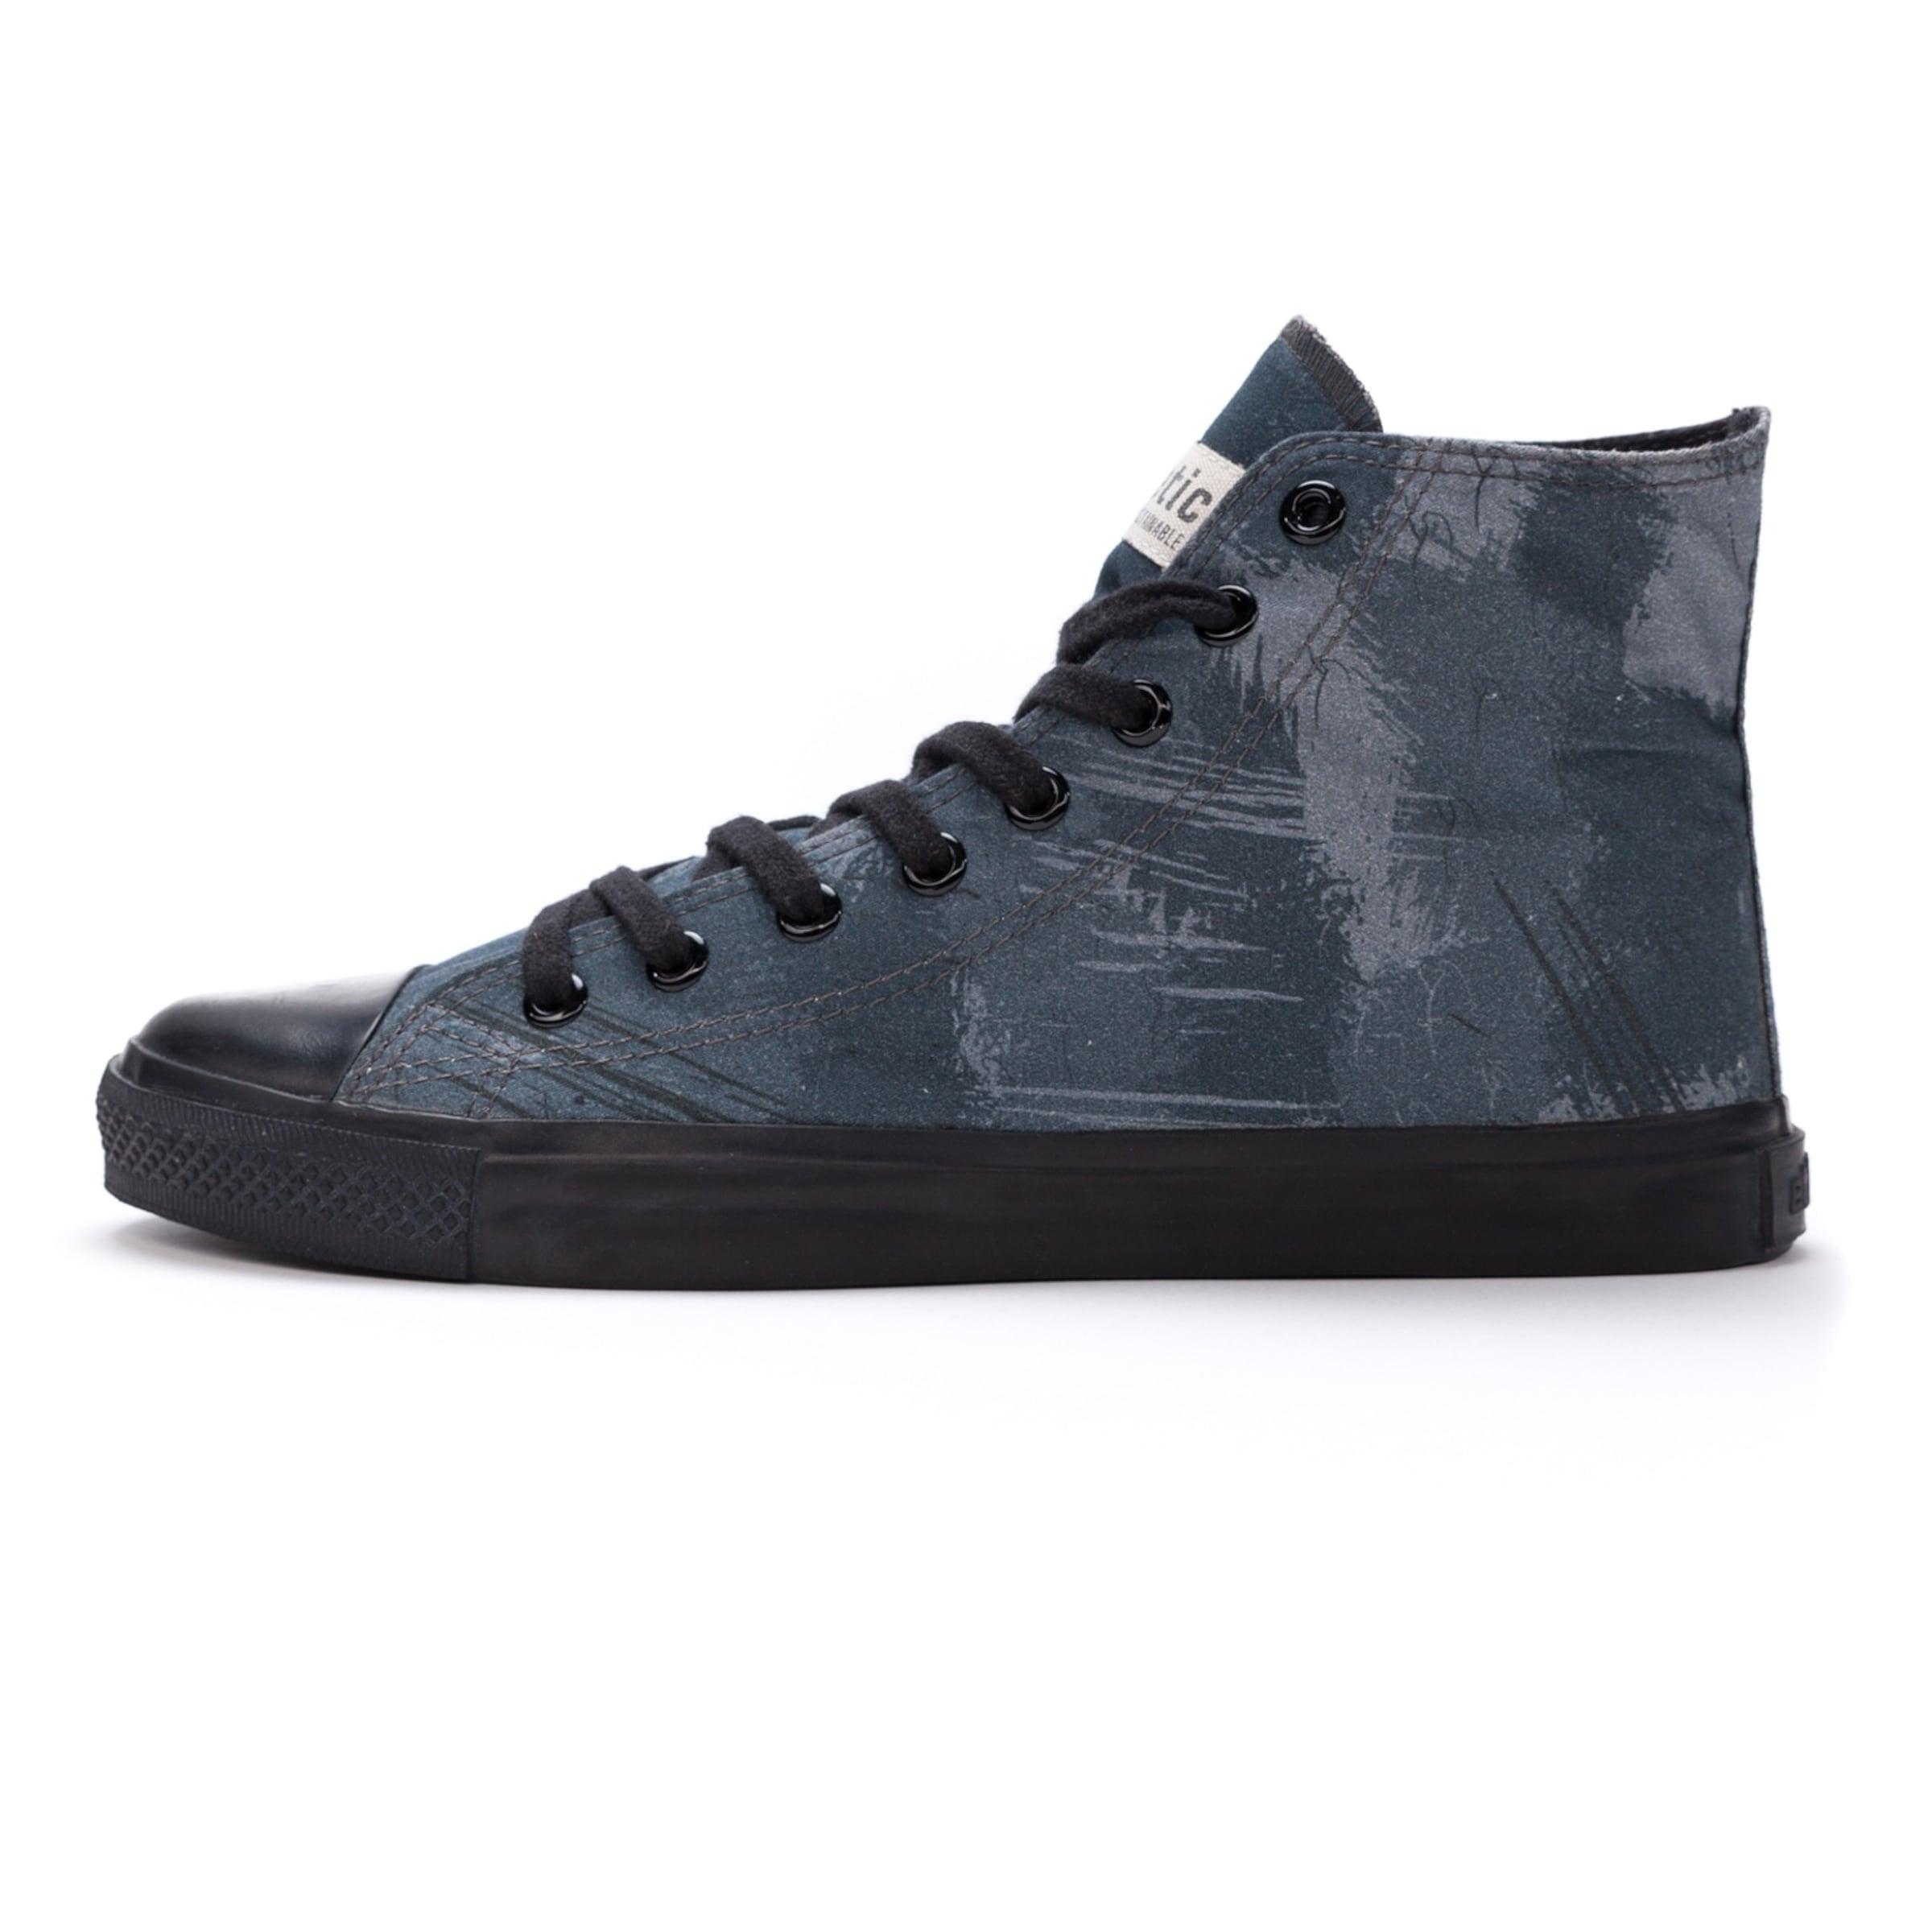 Sneaker RauchblauDunkelblau In Ethletic Ethletic Schwarz eWEI2bD9YH